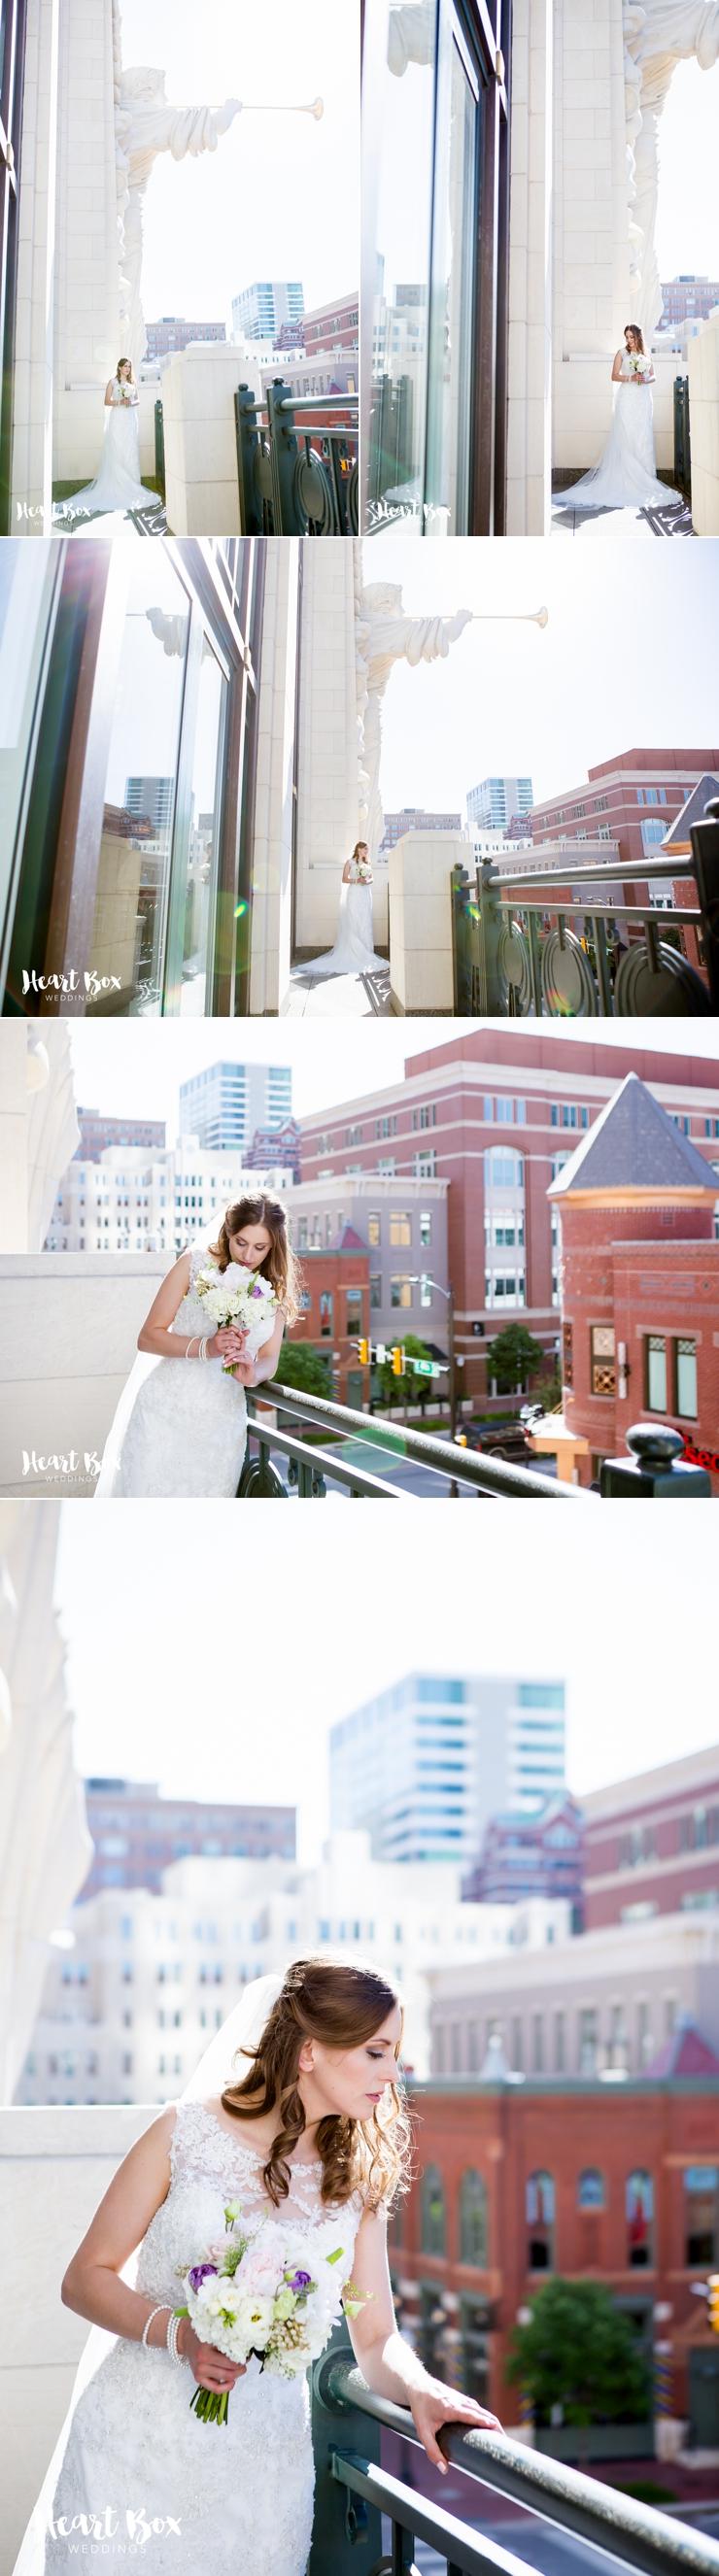 Sarah Lubrano Bridal Blog Collages 5.jpg